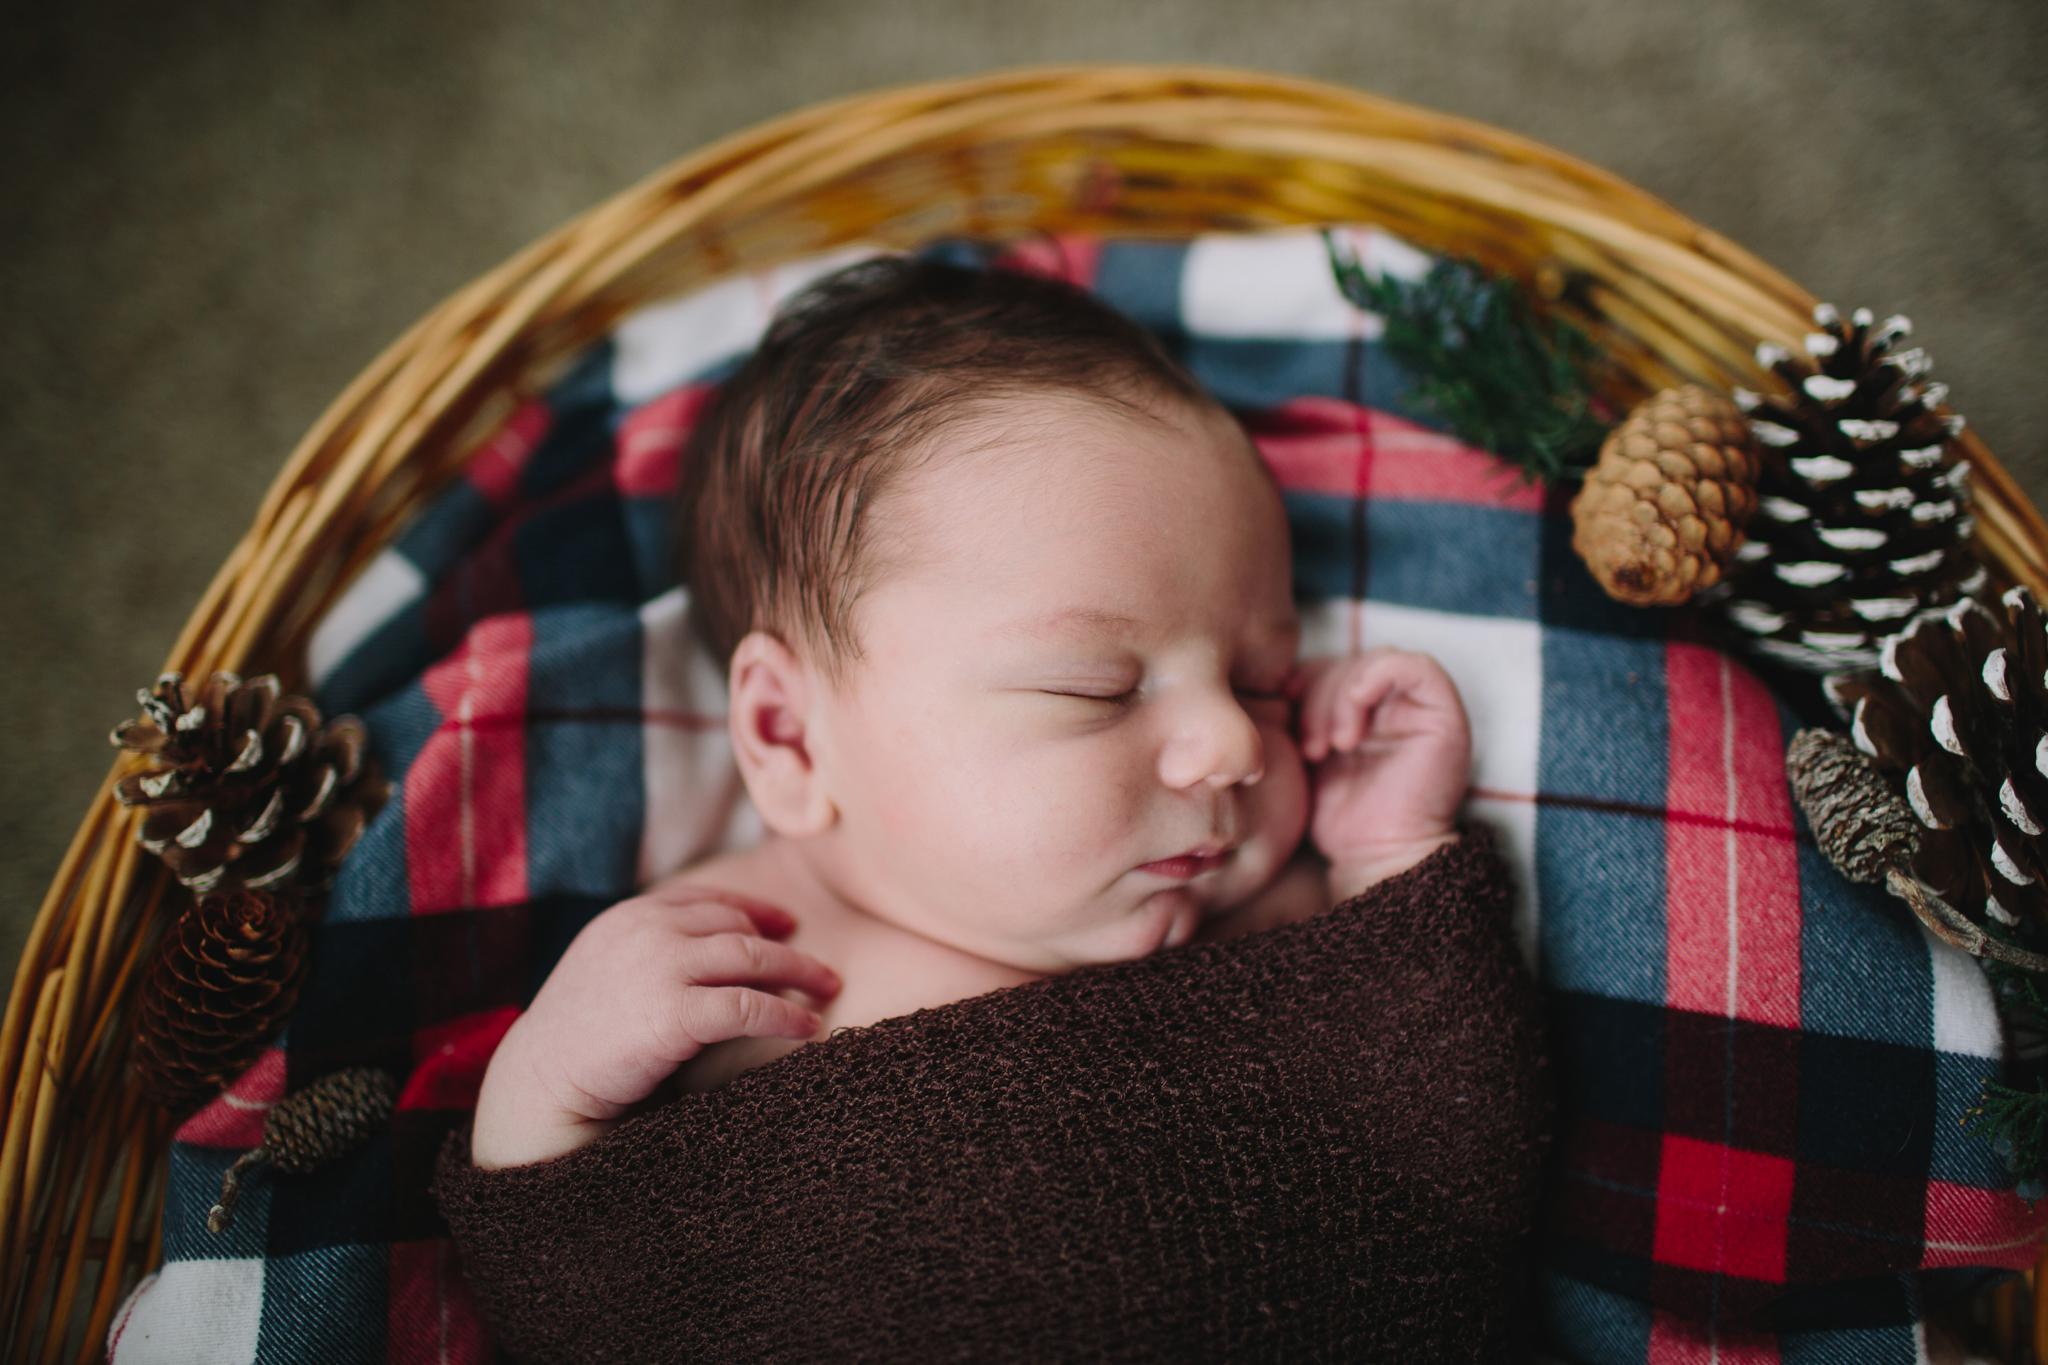 tunkhannock_newborn_photographer_4434.jpg